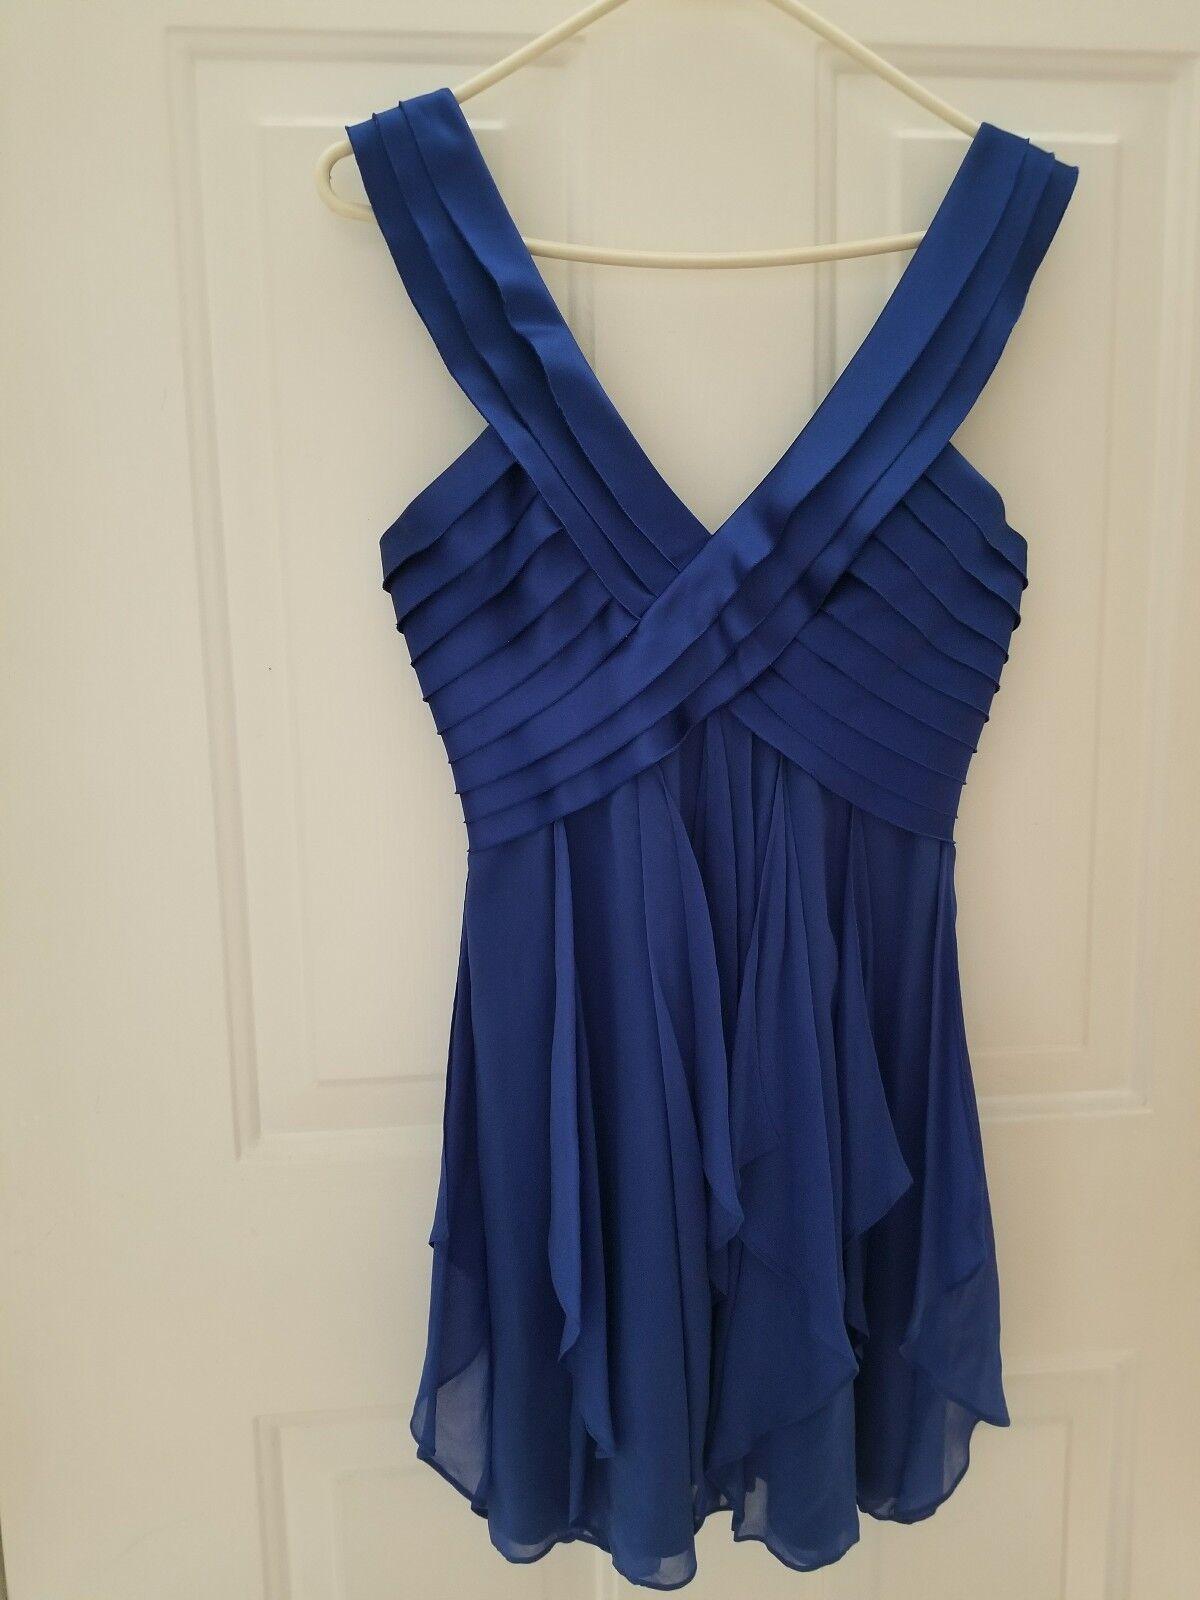 BCBG MAX AZRIA Sapphire bluee Silk Dress Sz 4